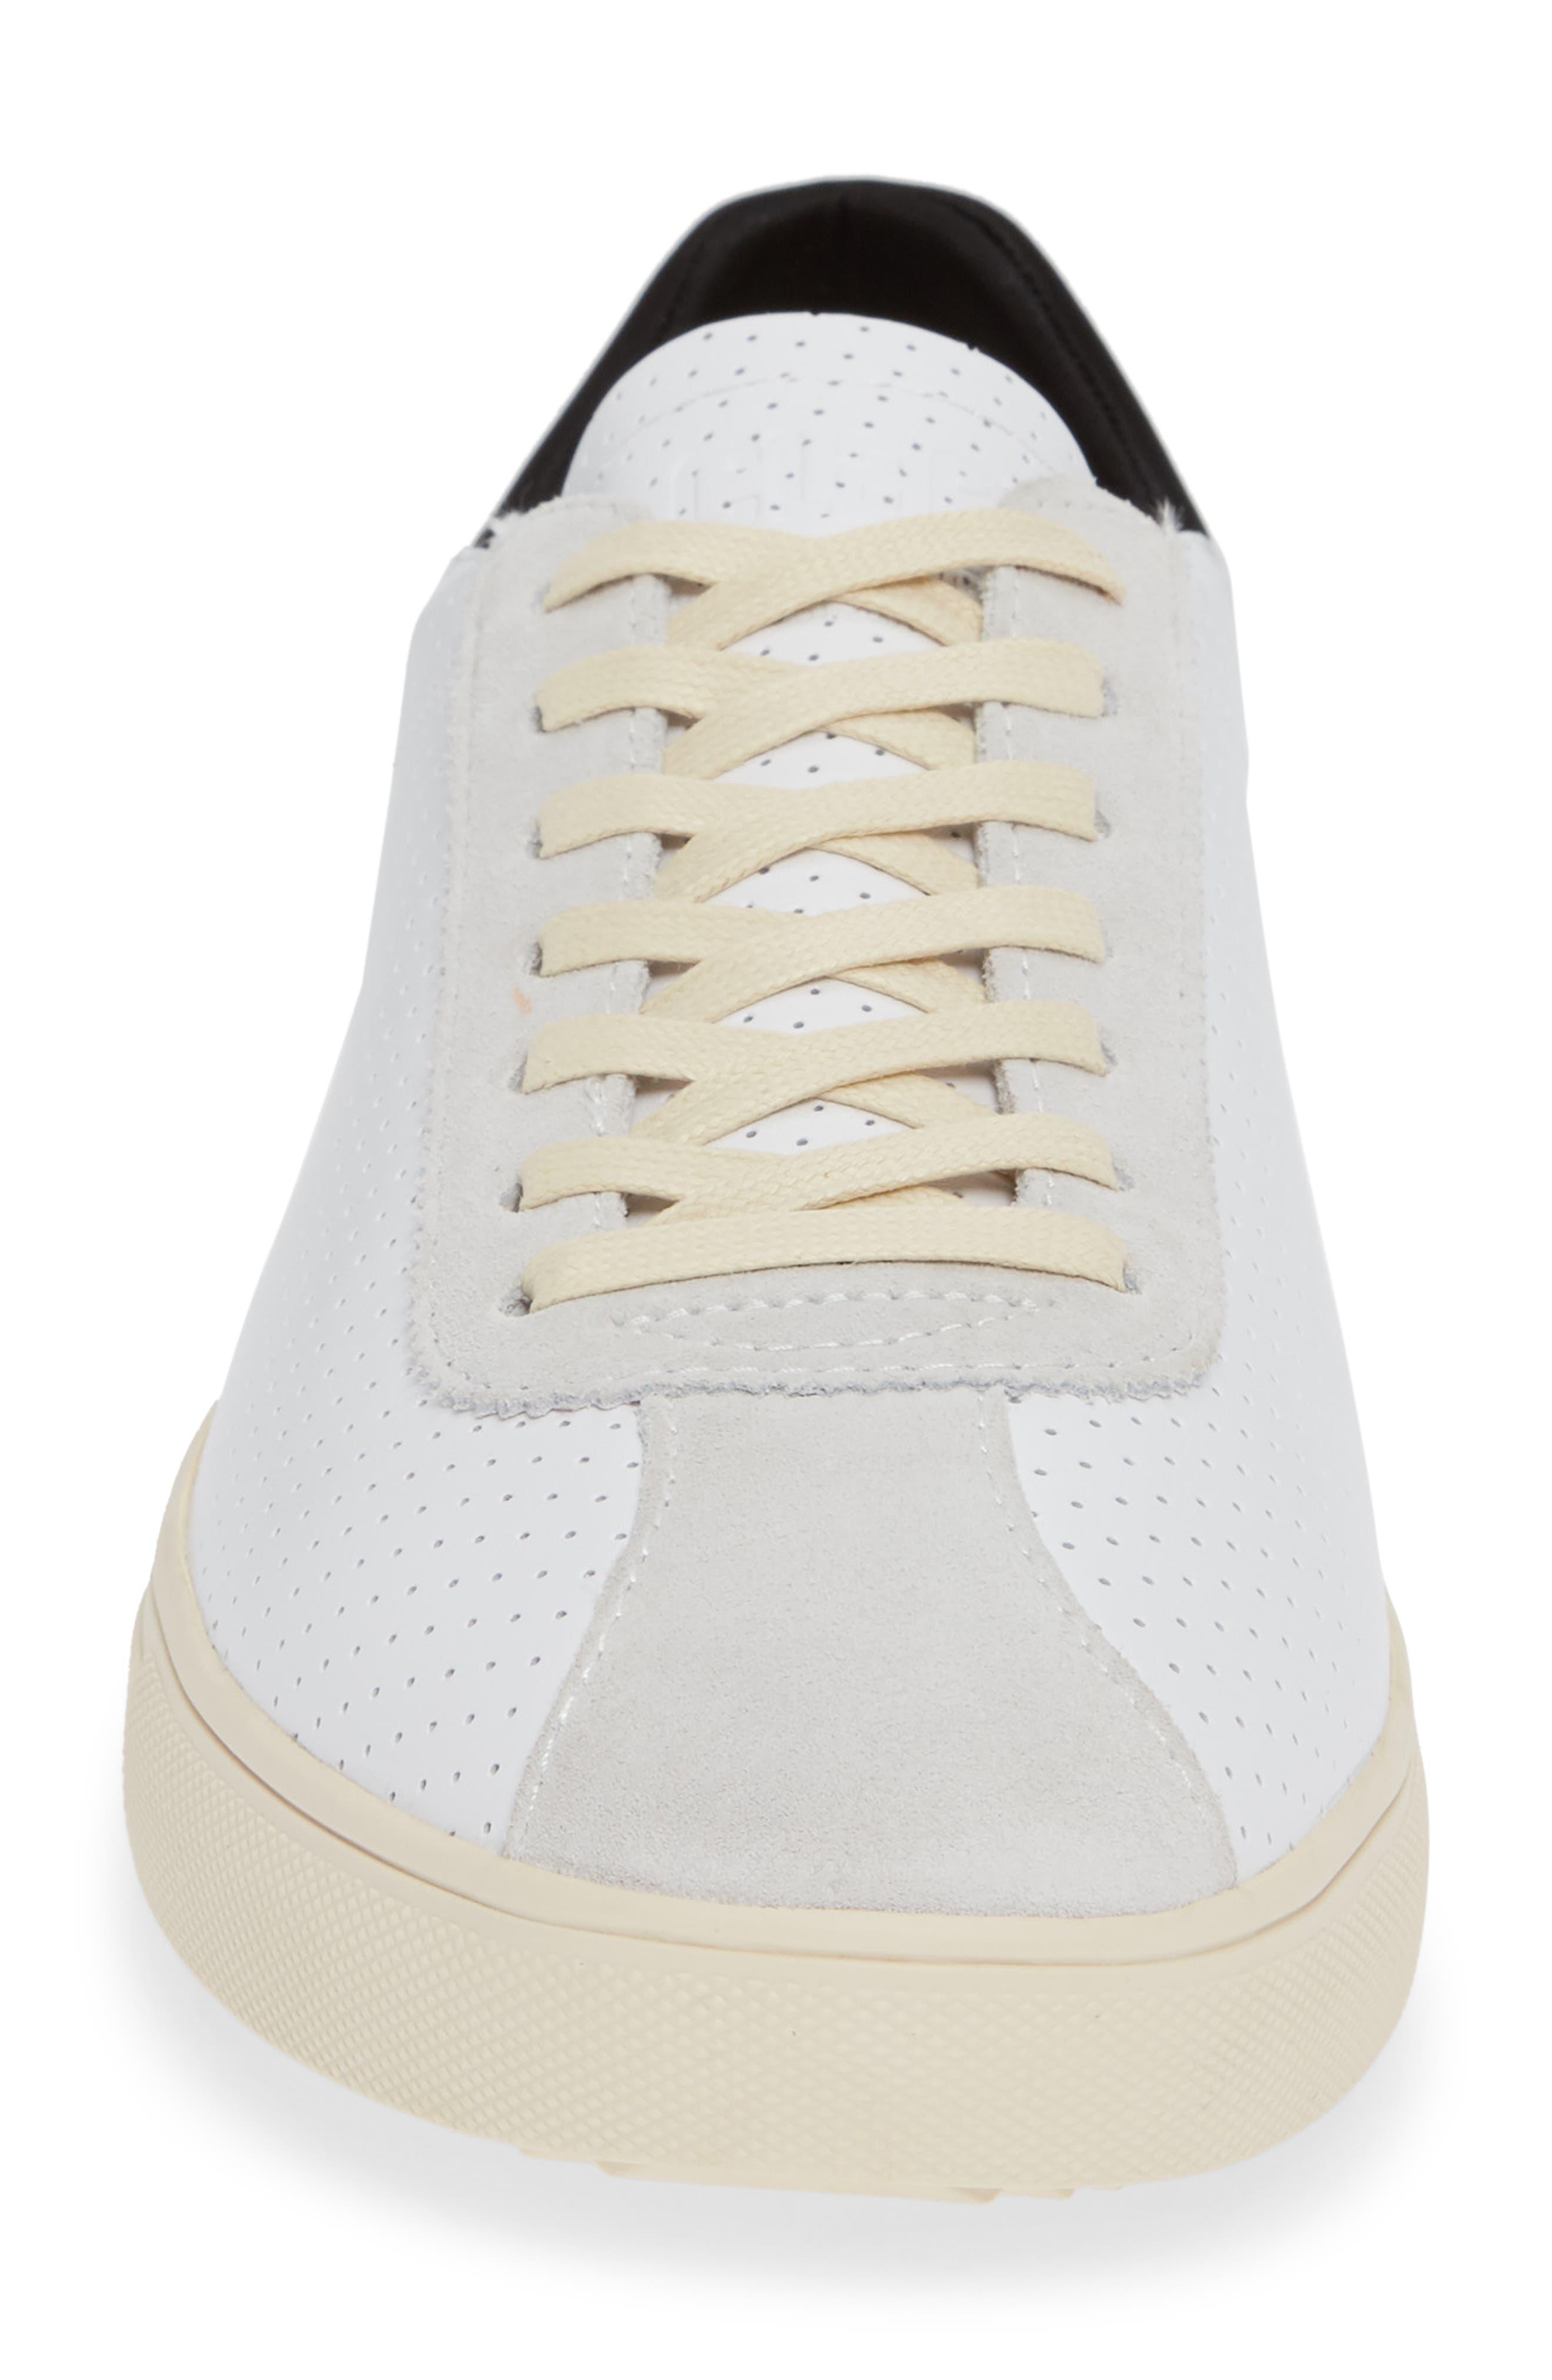 Noah Sneaker,                             Alternate thumbnail 4, color,                             WHITE LEATHER SUEDE CREAM